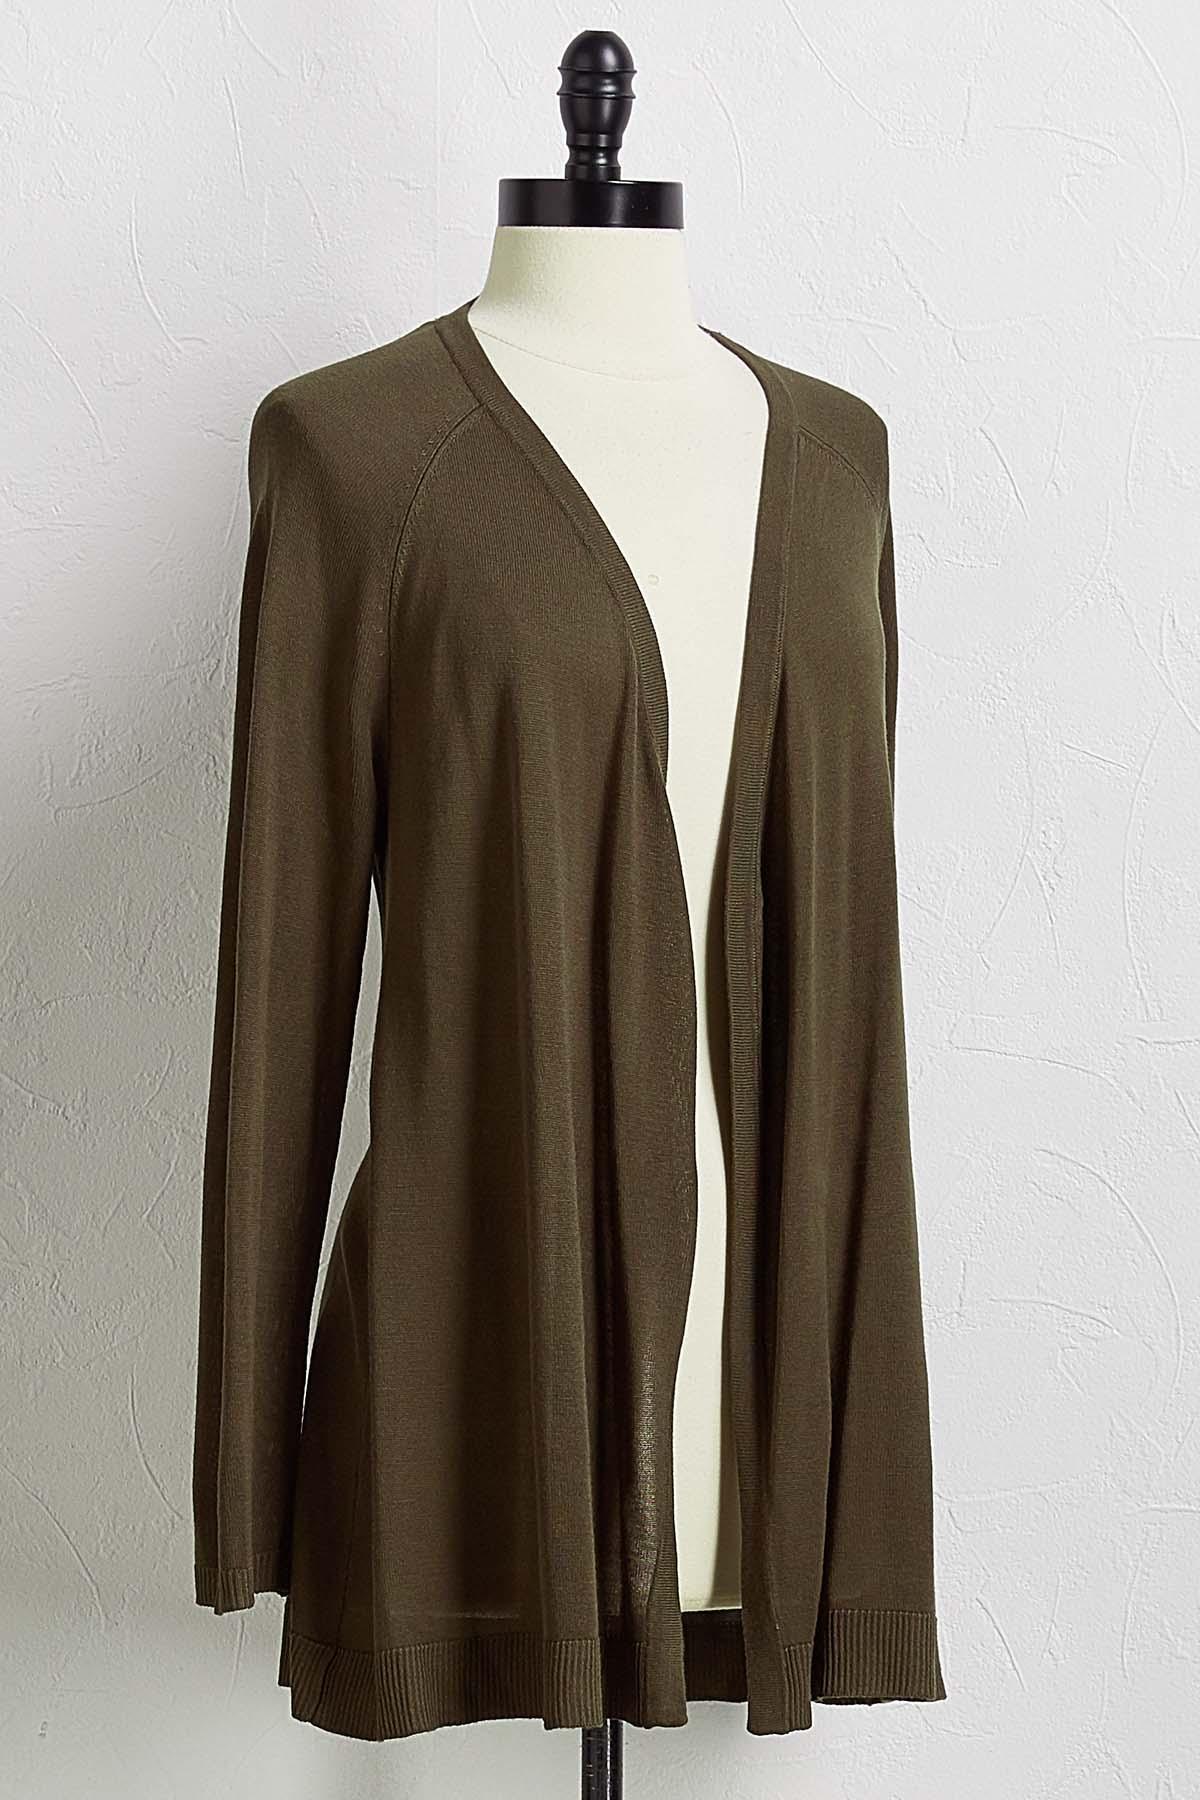 Olive Cardigan Sweater